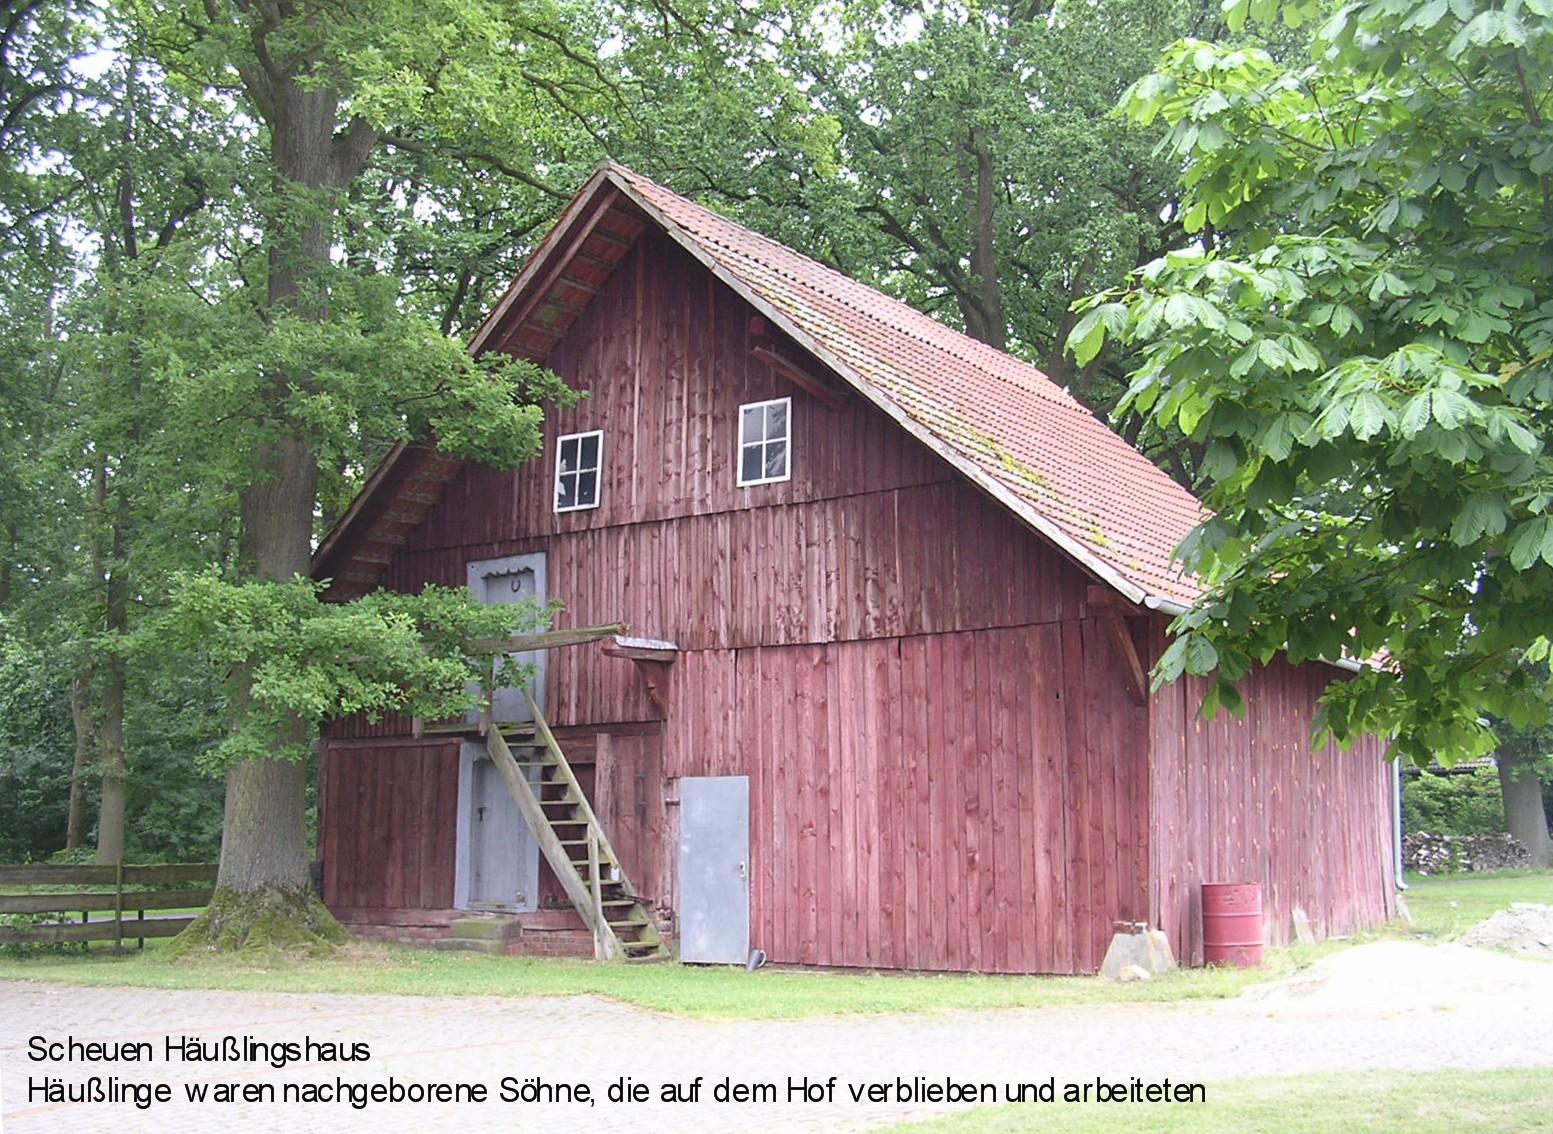 h-scheuen-haeußlingshaus